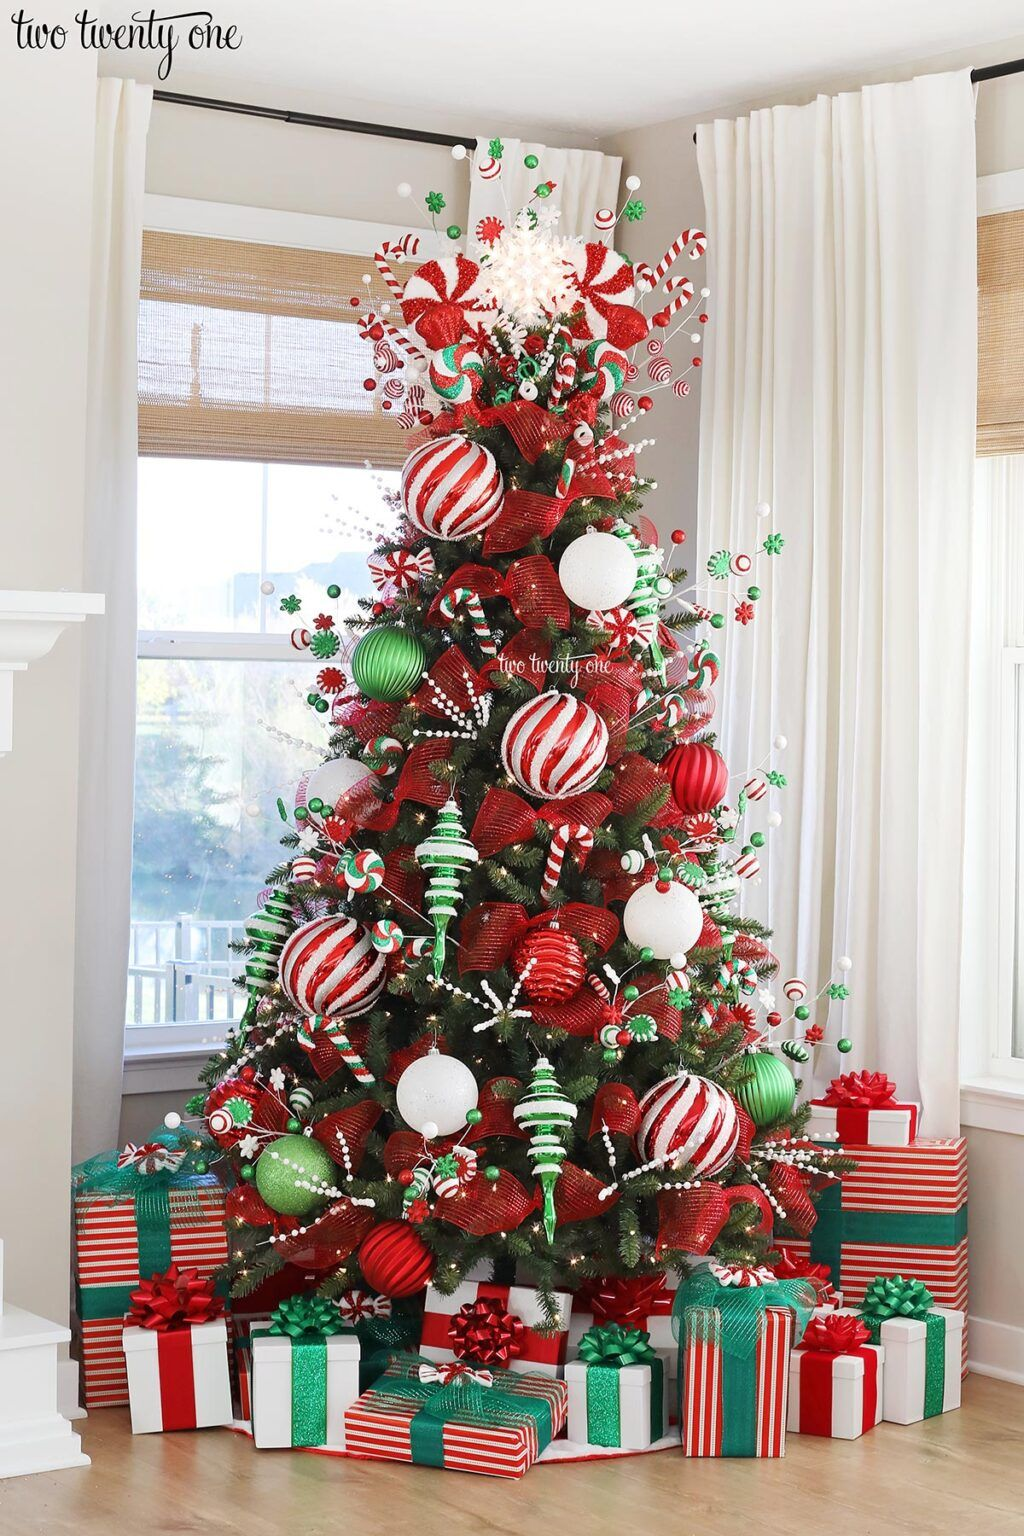 Peppermint Christmas Tree Cool Christmas Trees Candy Christmas Tree Peppermint Christmas